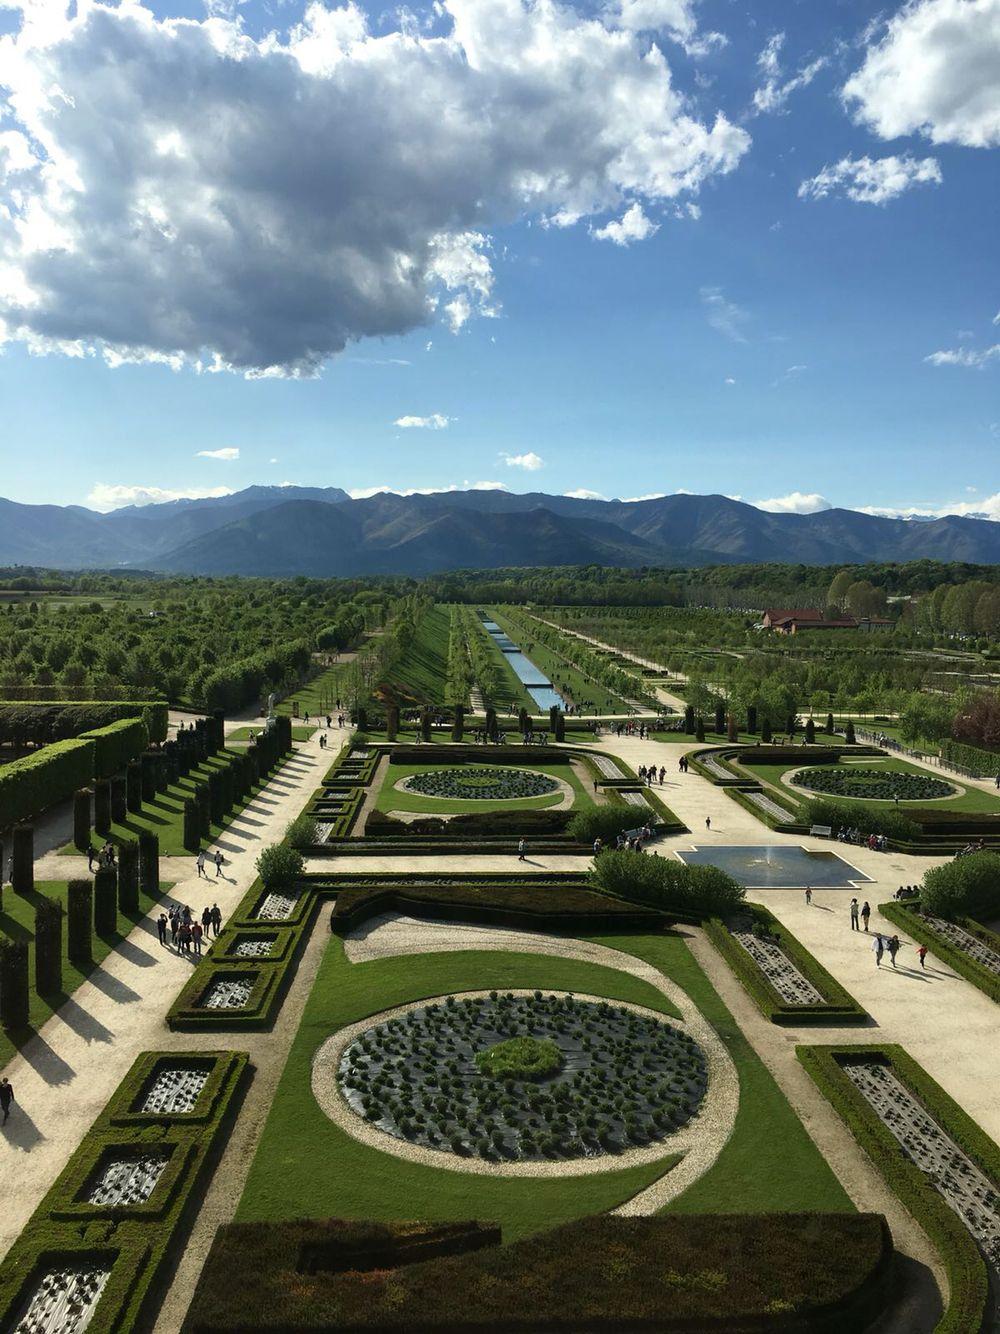 Giardini La Reggia Di Venaria Giardino, Reggio